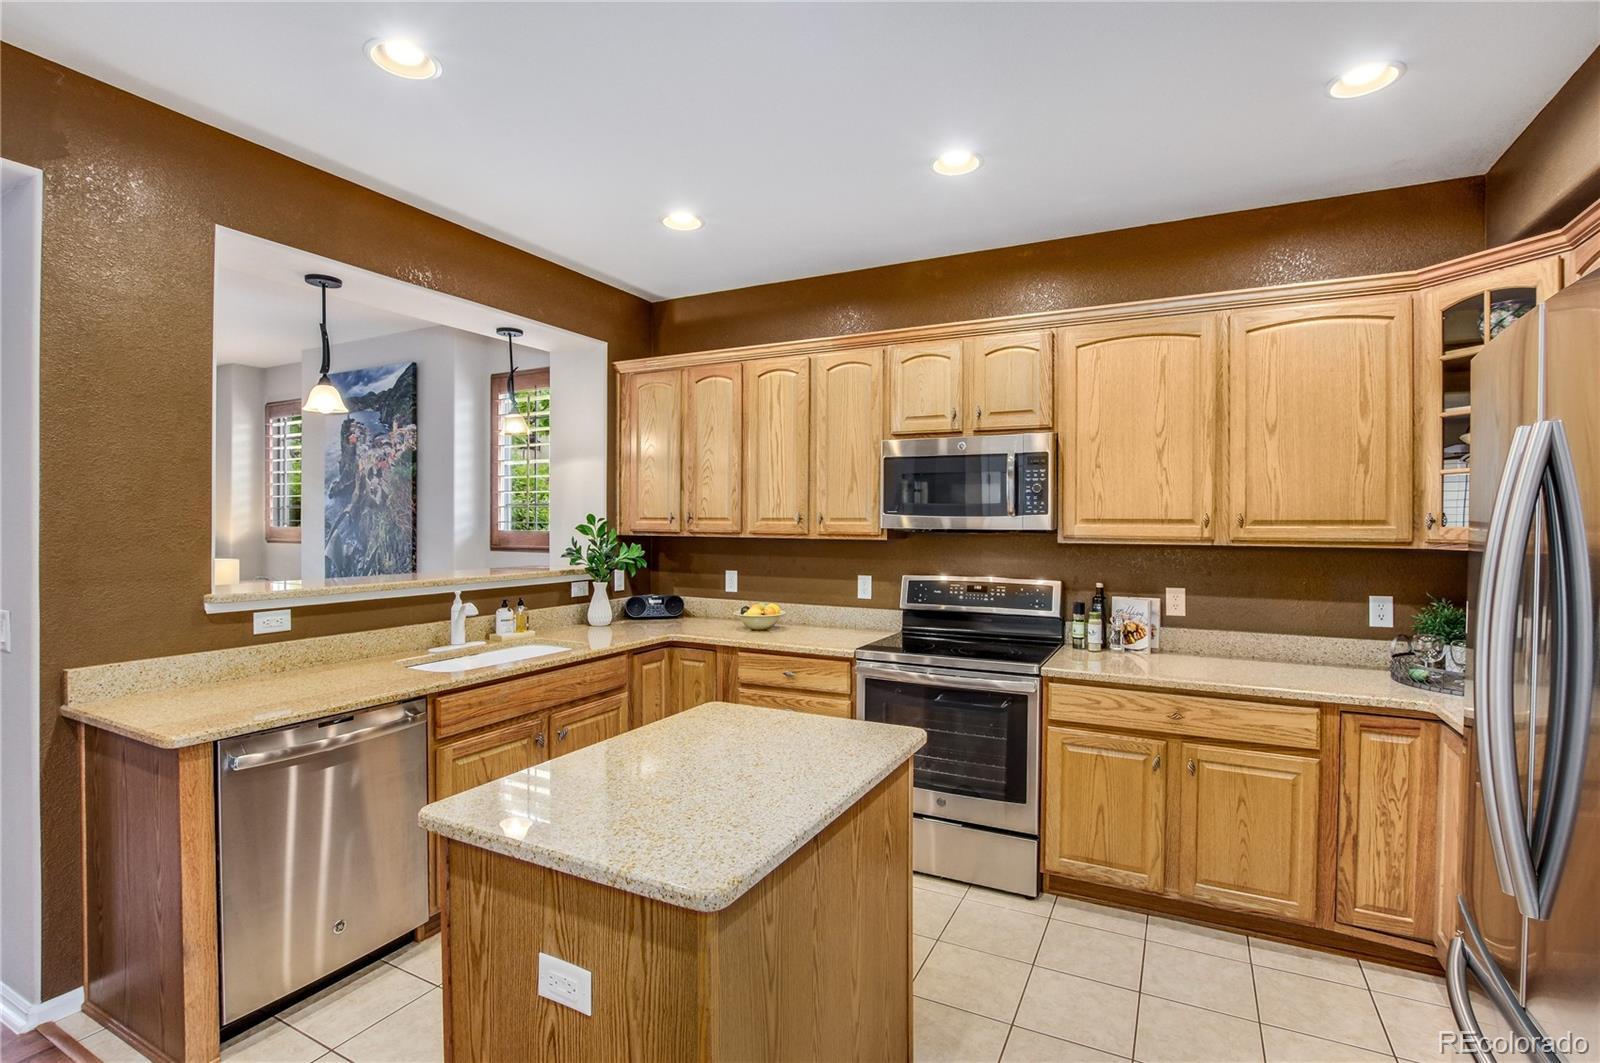 MLS# 5633741 - 15 - 9477 Cedarhurst Lane #A, Highlands Ranch, CO 80129